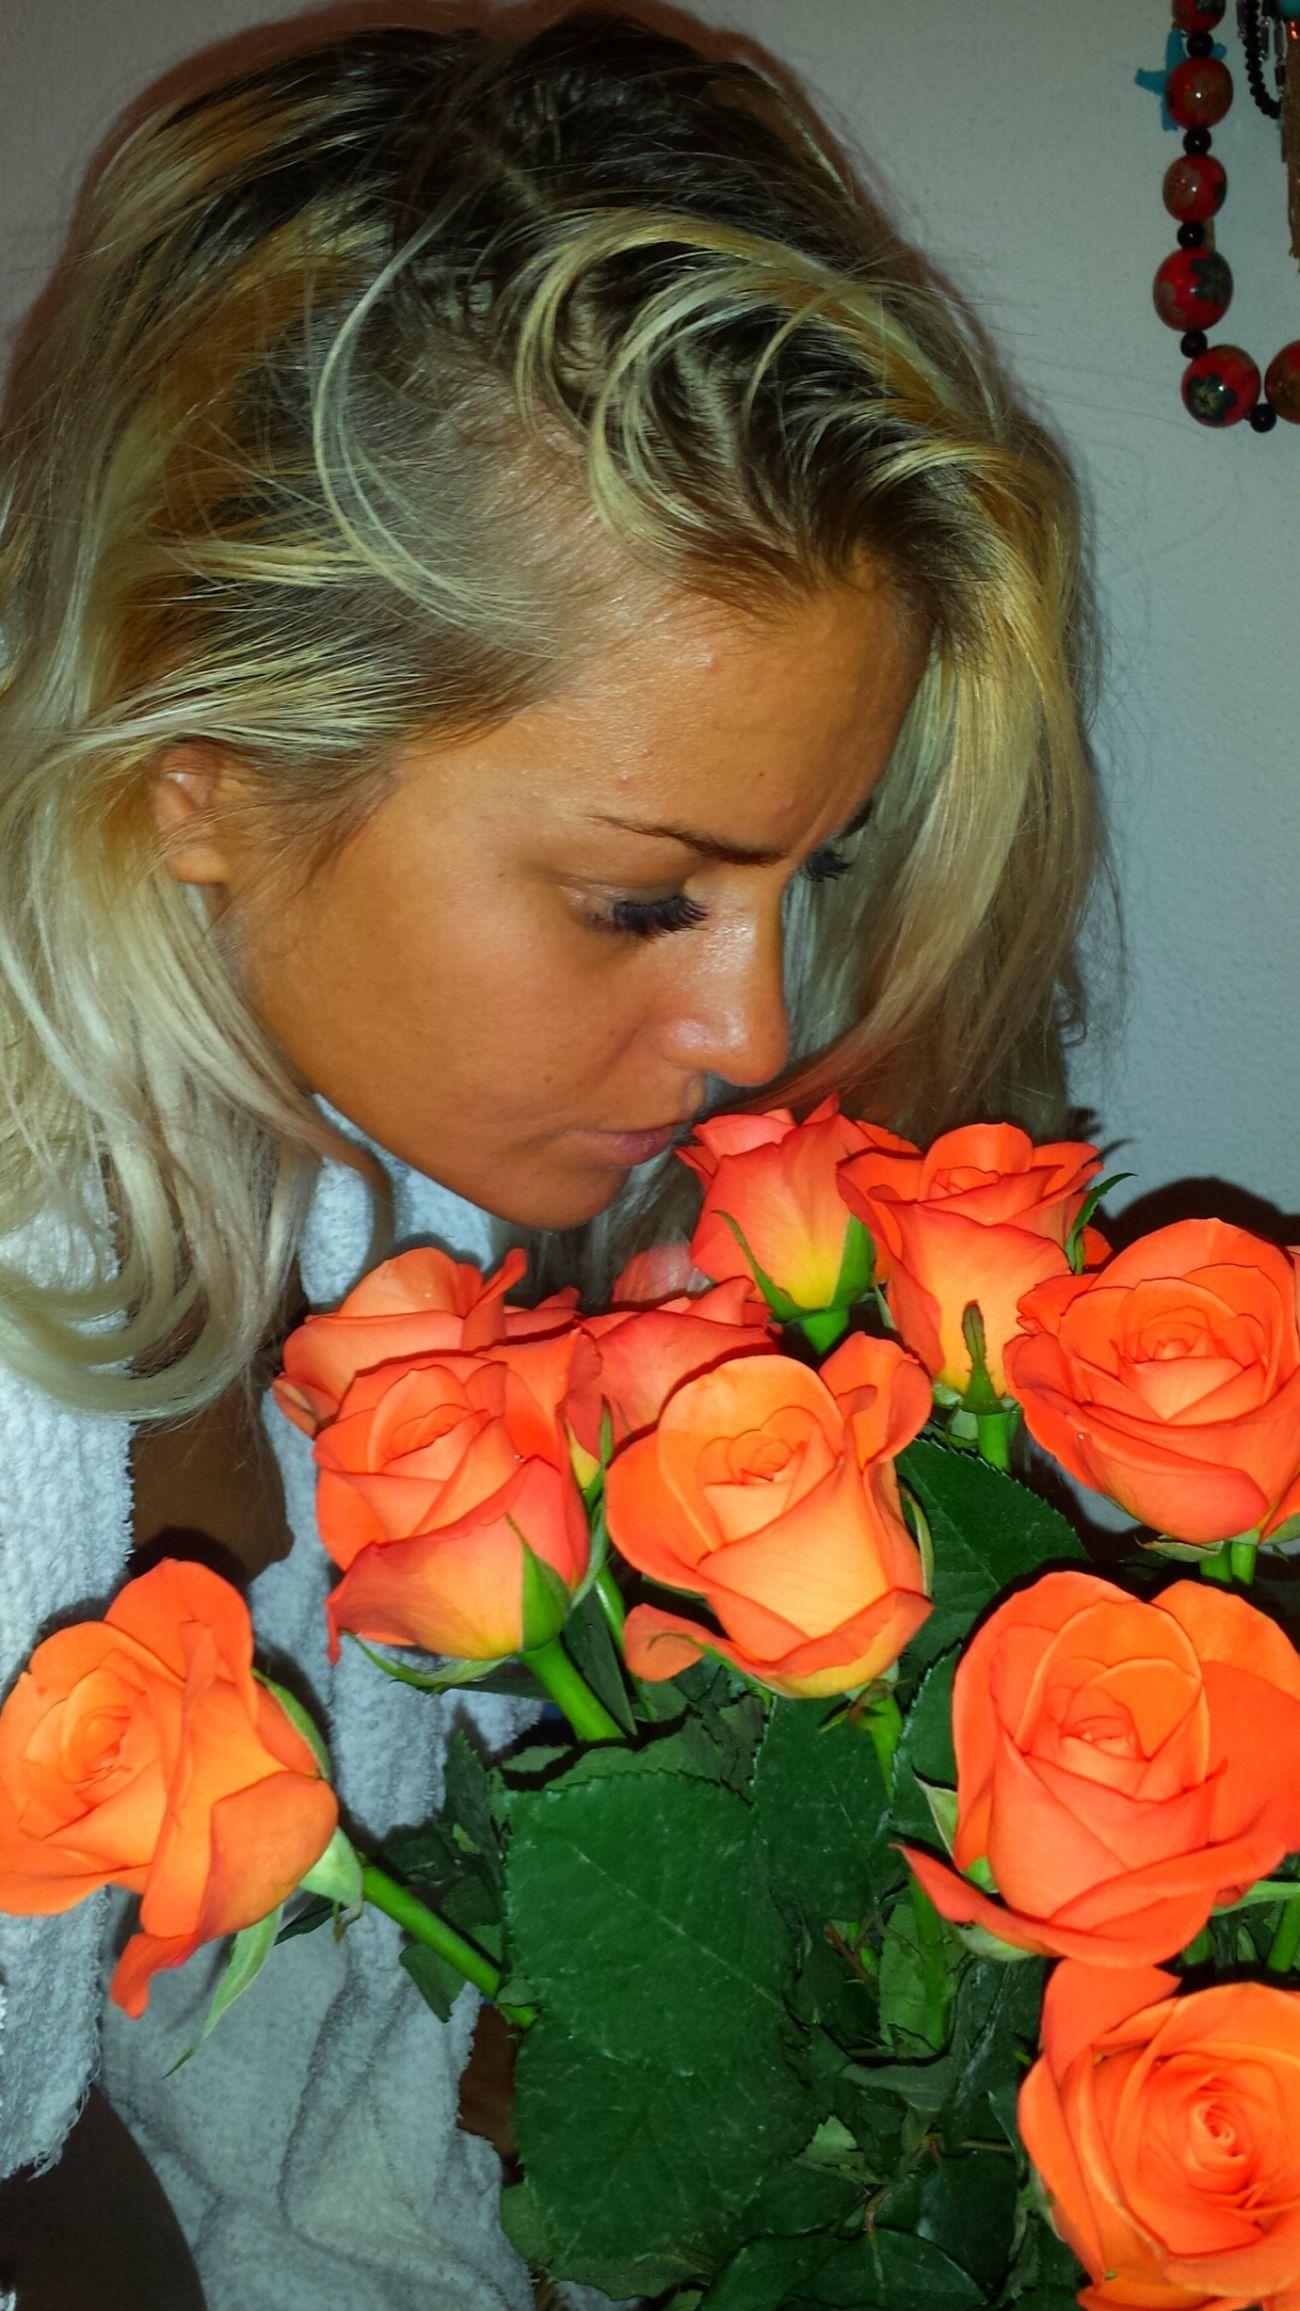 Big Love Rose♥ Morning Mood!!!!!!!! Smile ✌